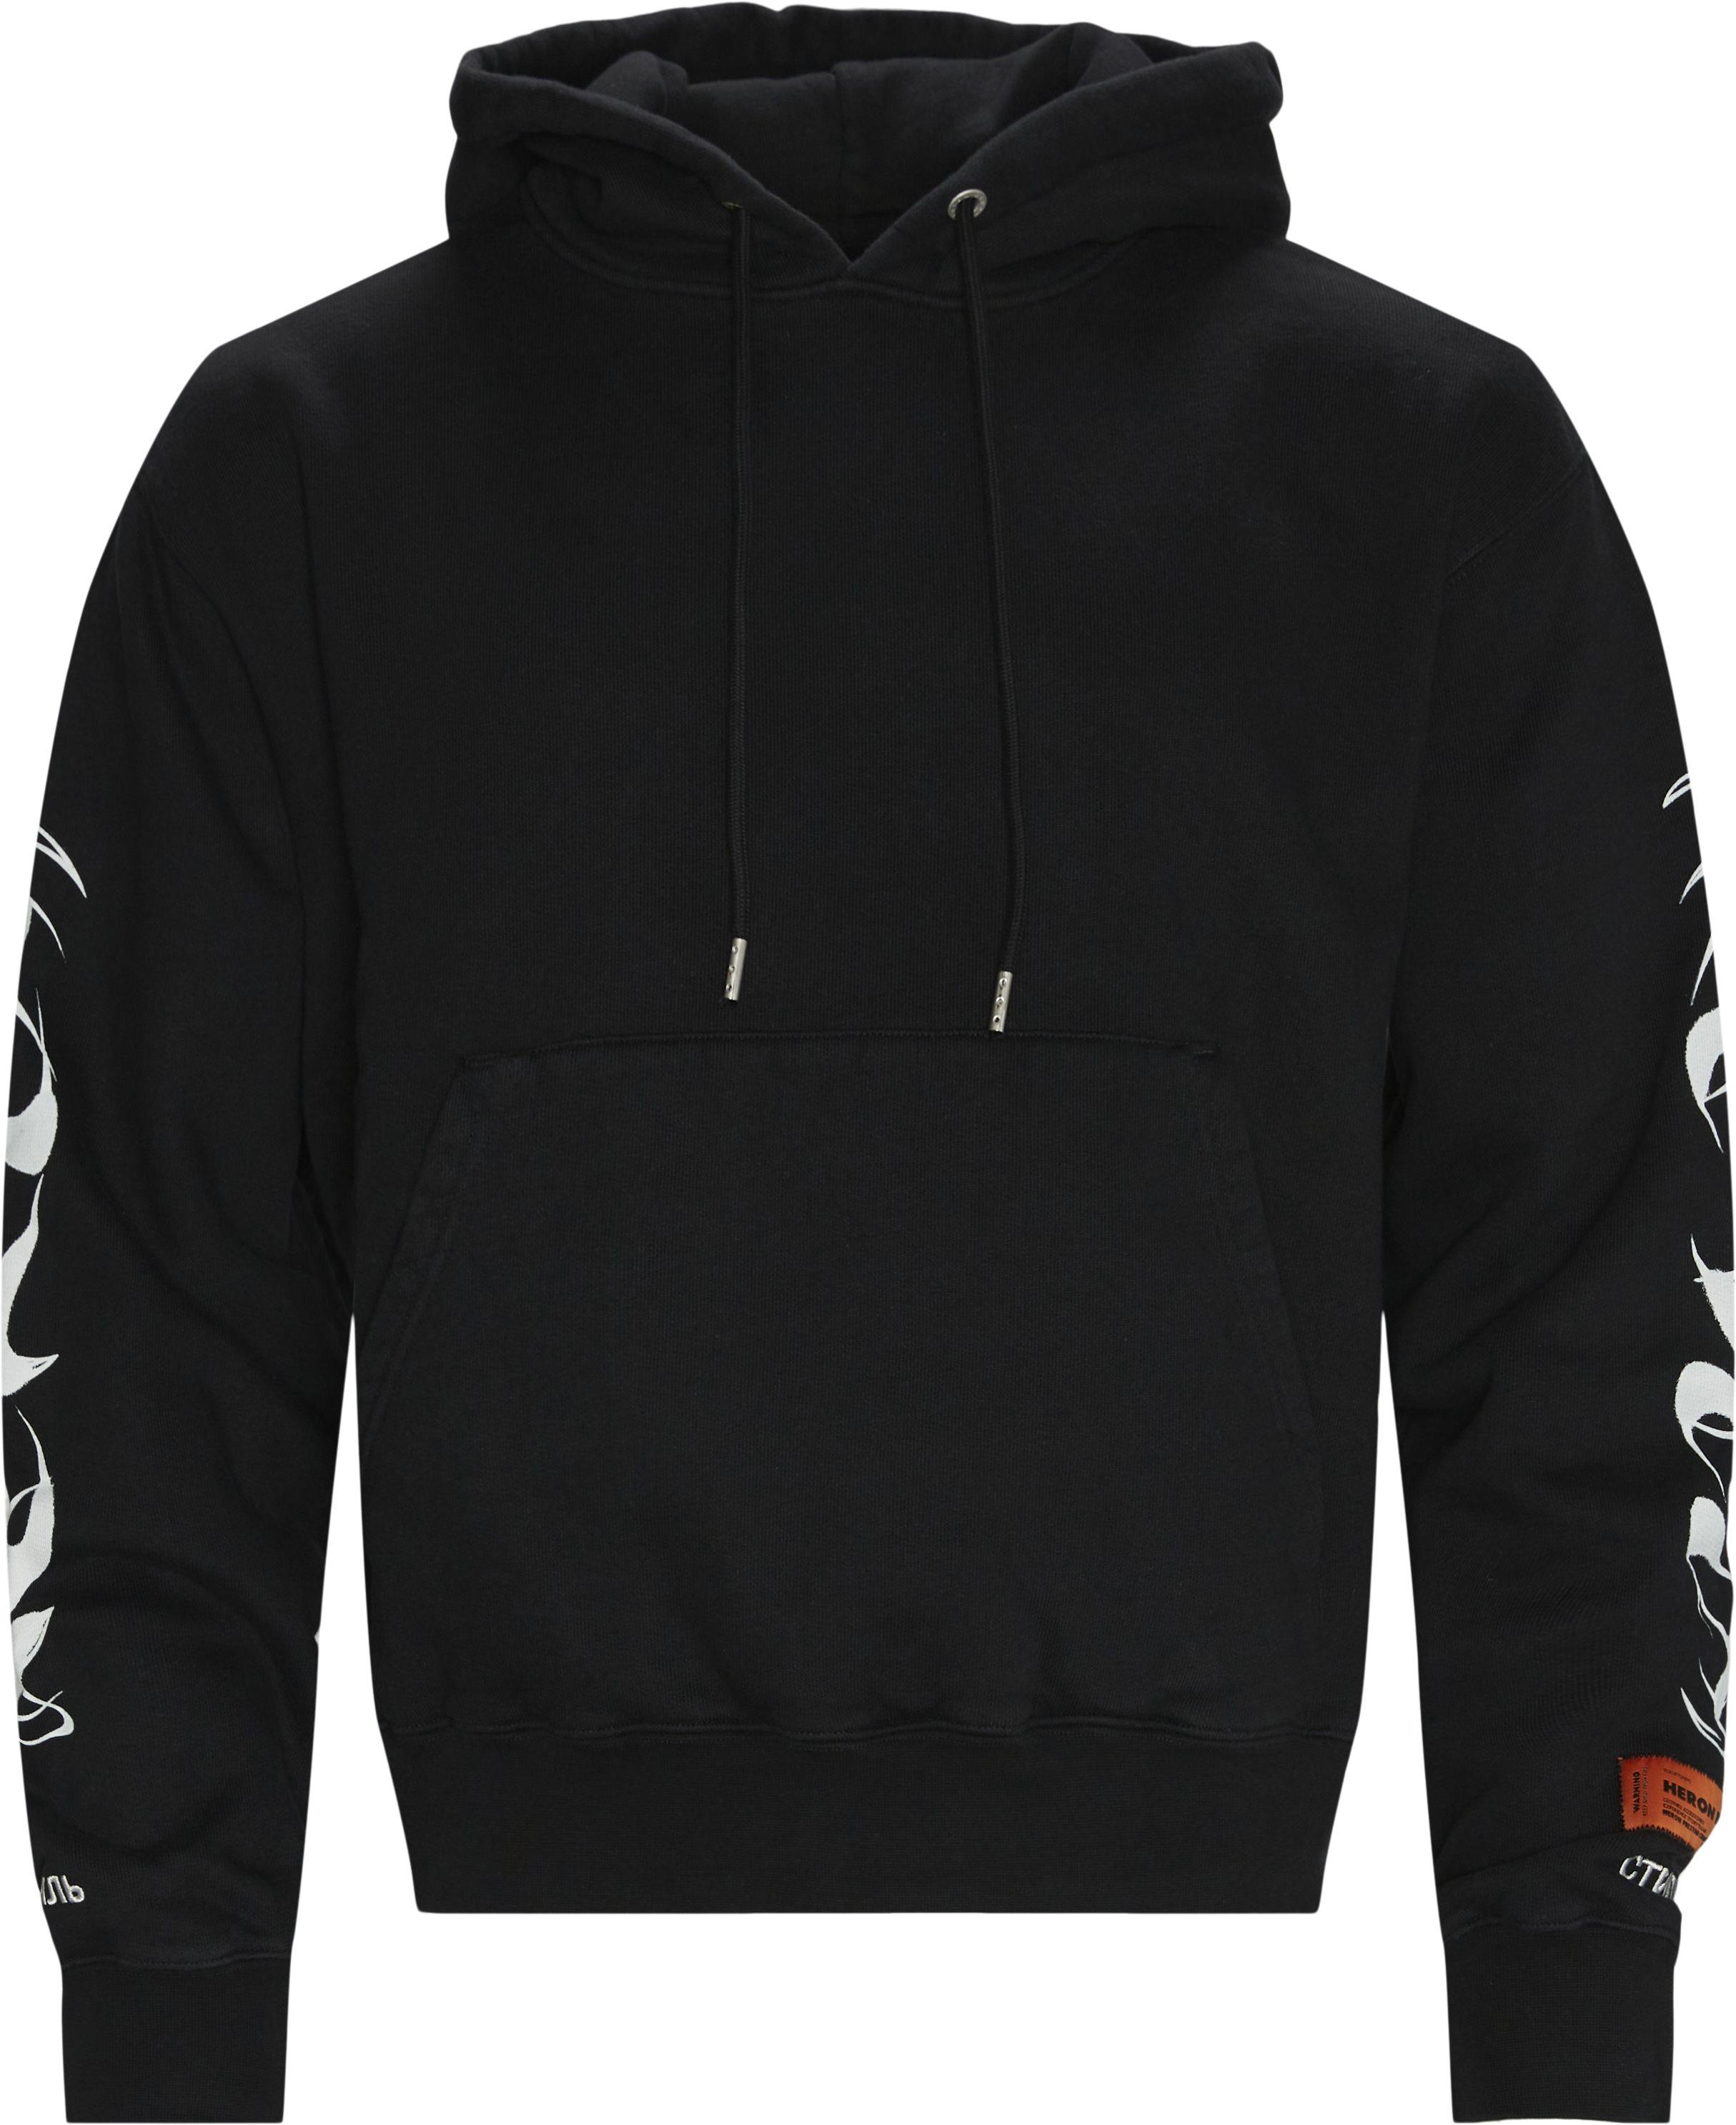 Sweatshirts - Oversize fit - Black